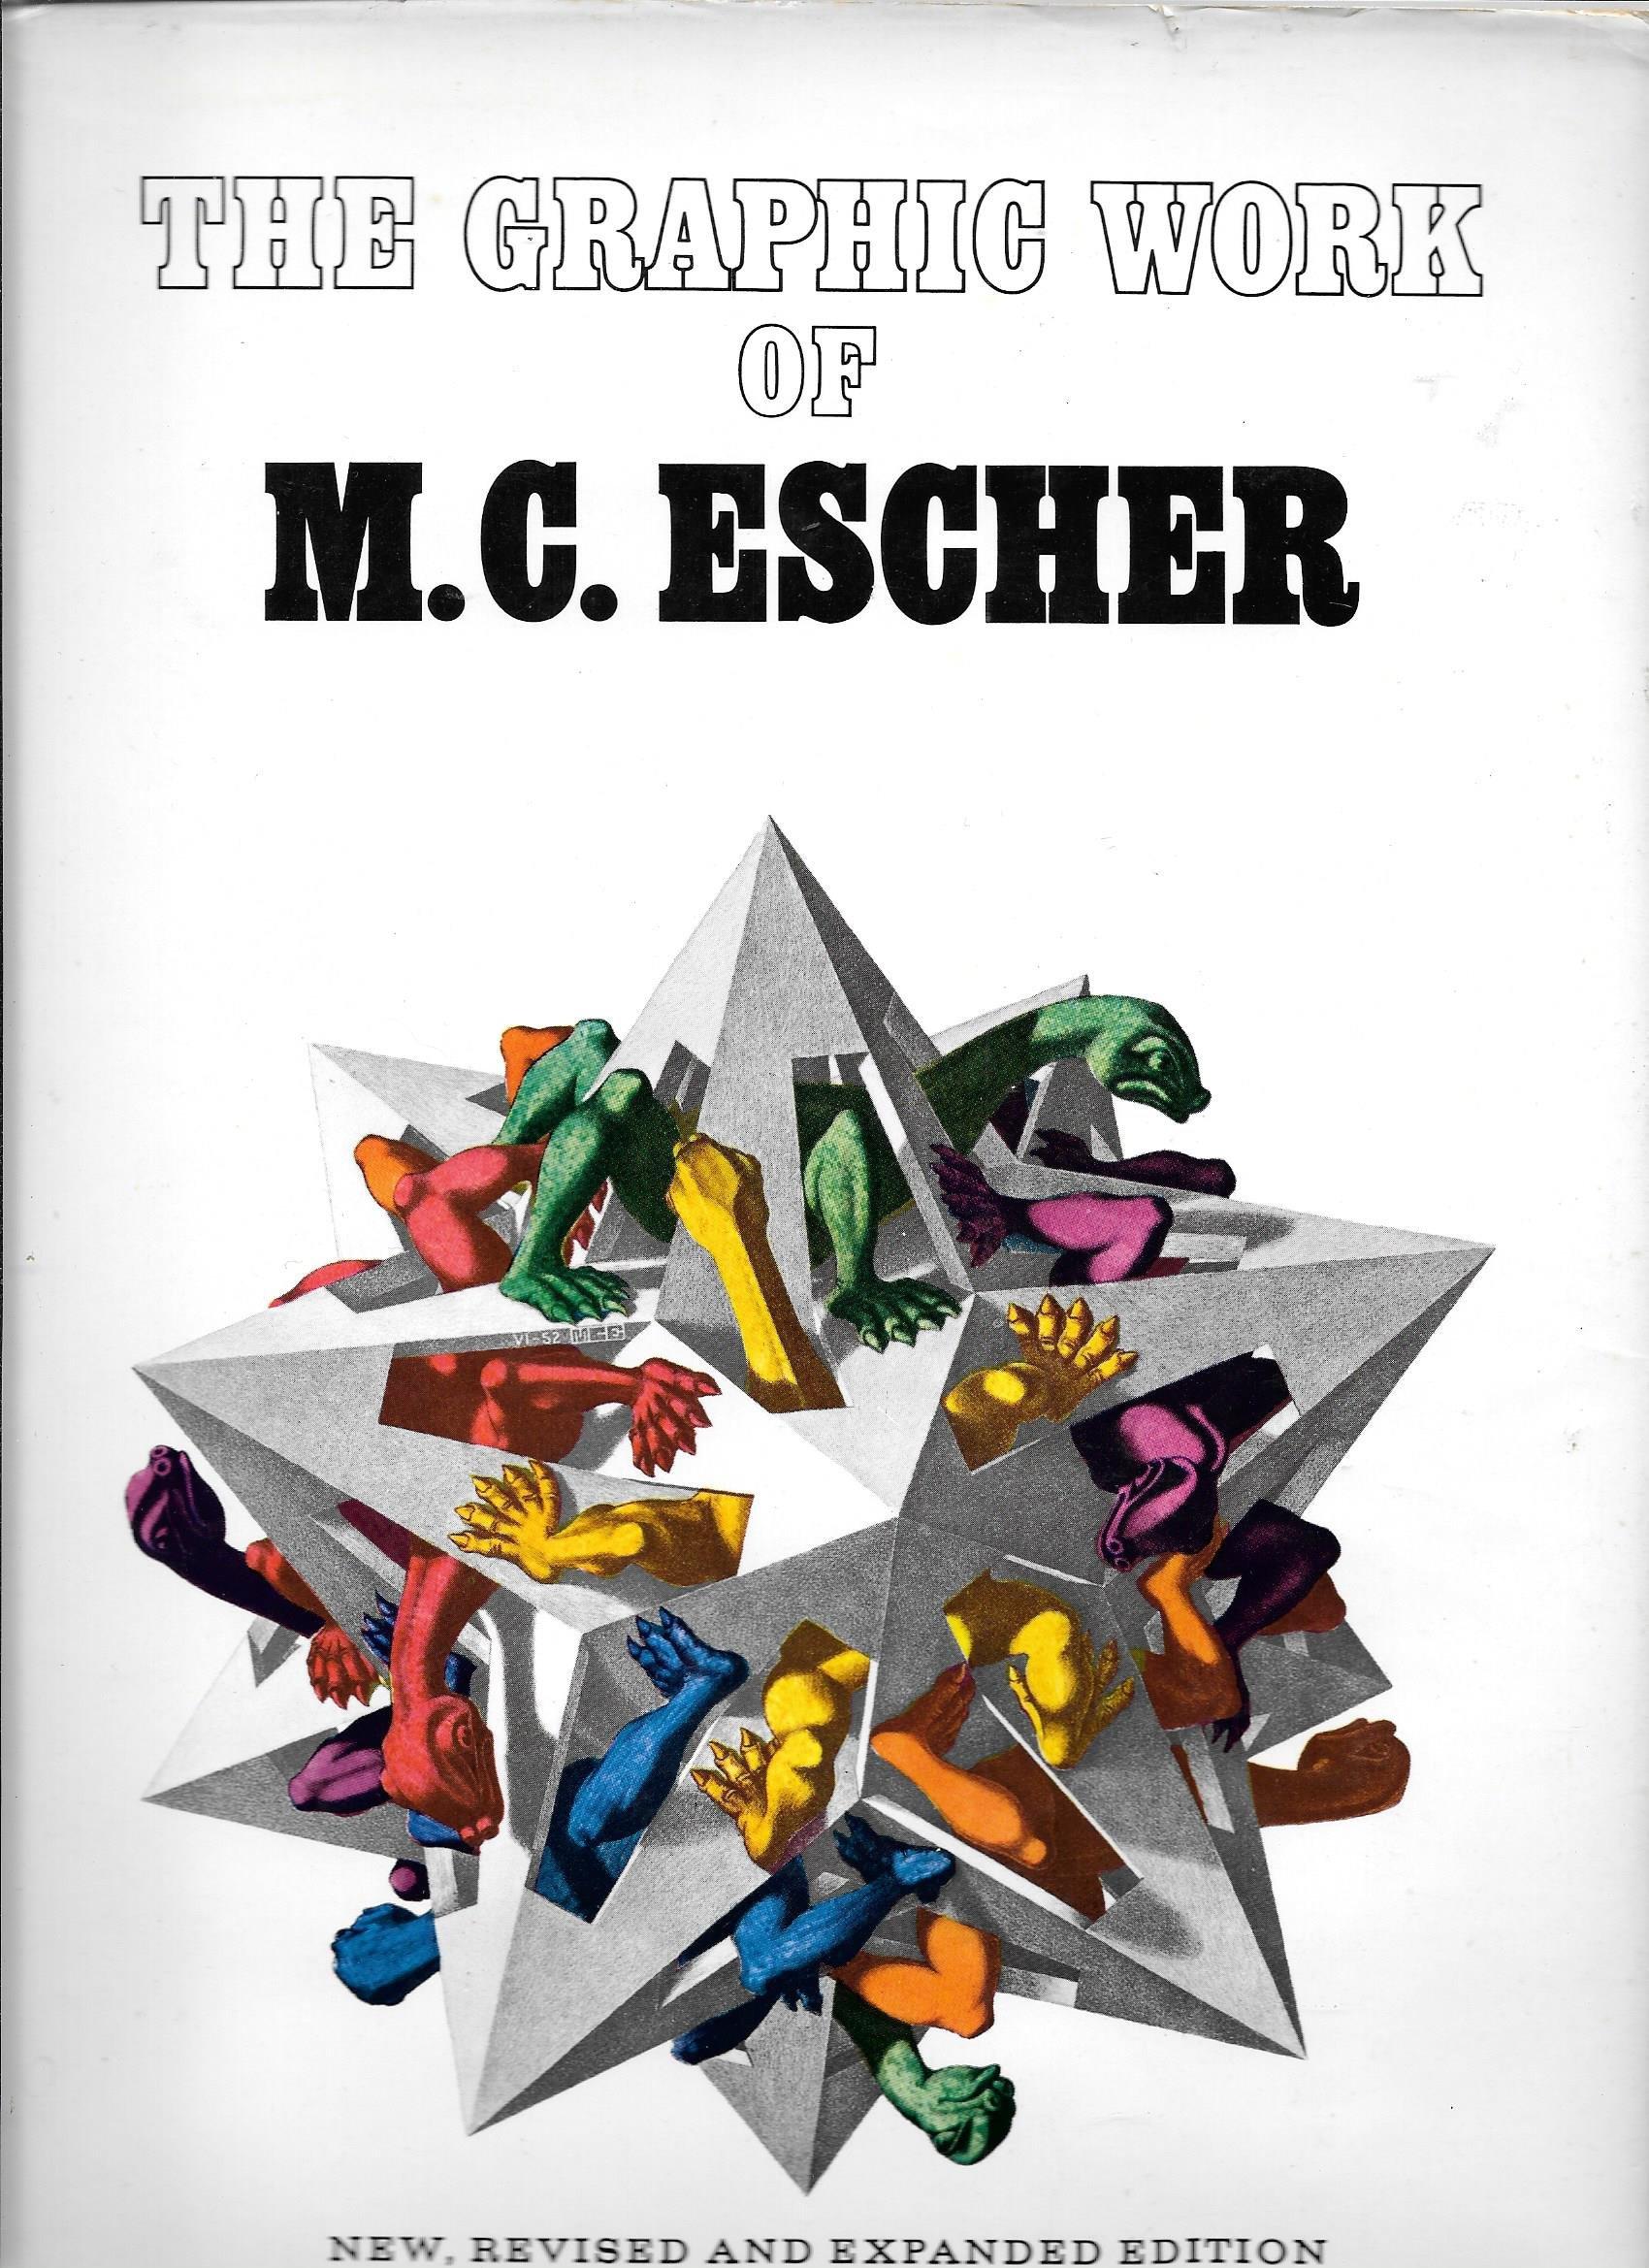 Download Mc Escher The Graphic Work By Mc Escher